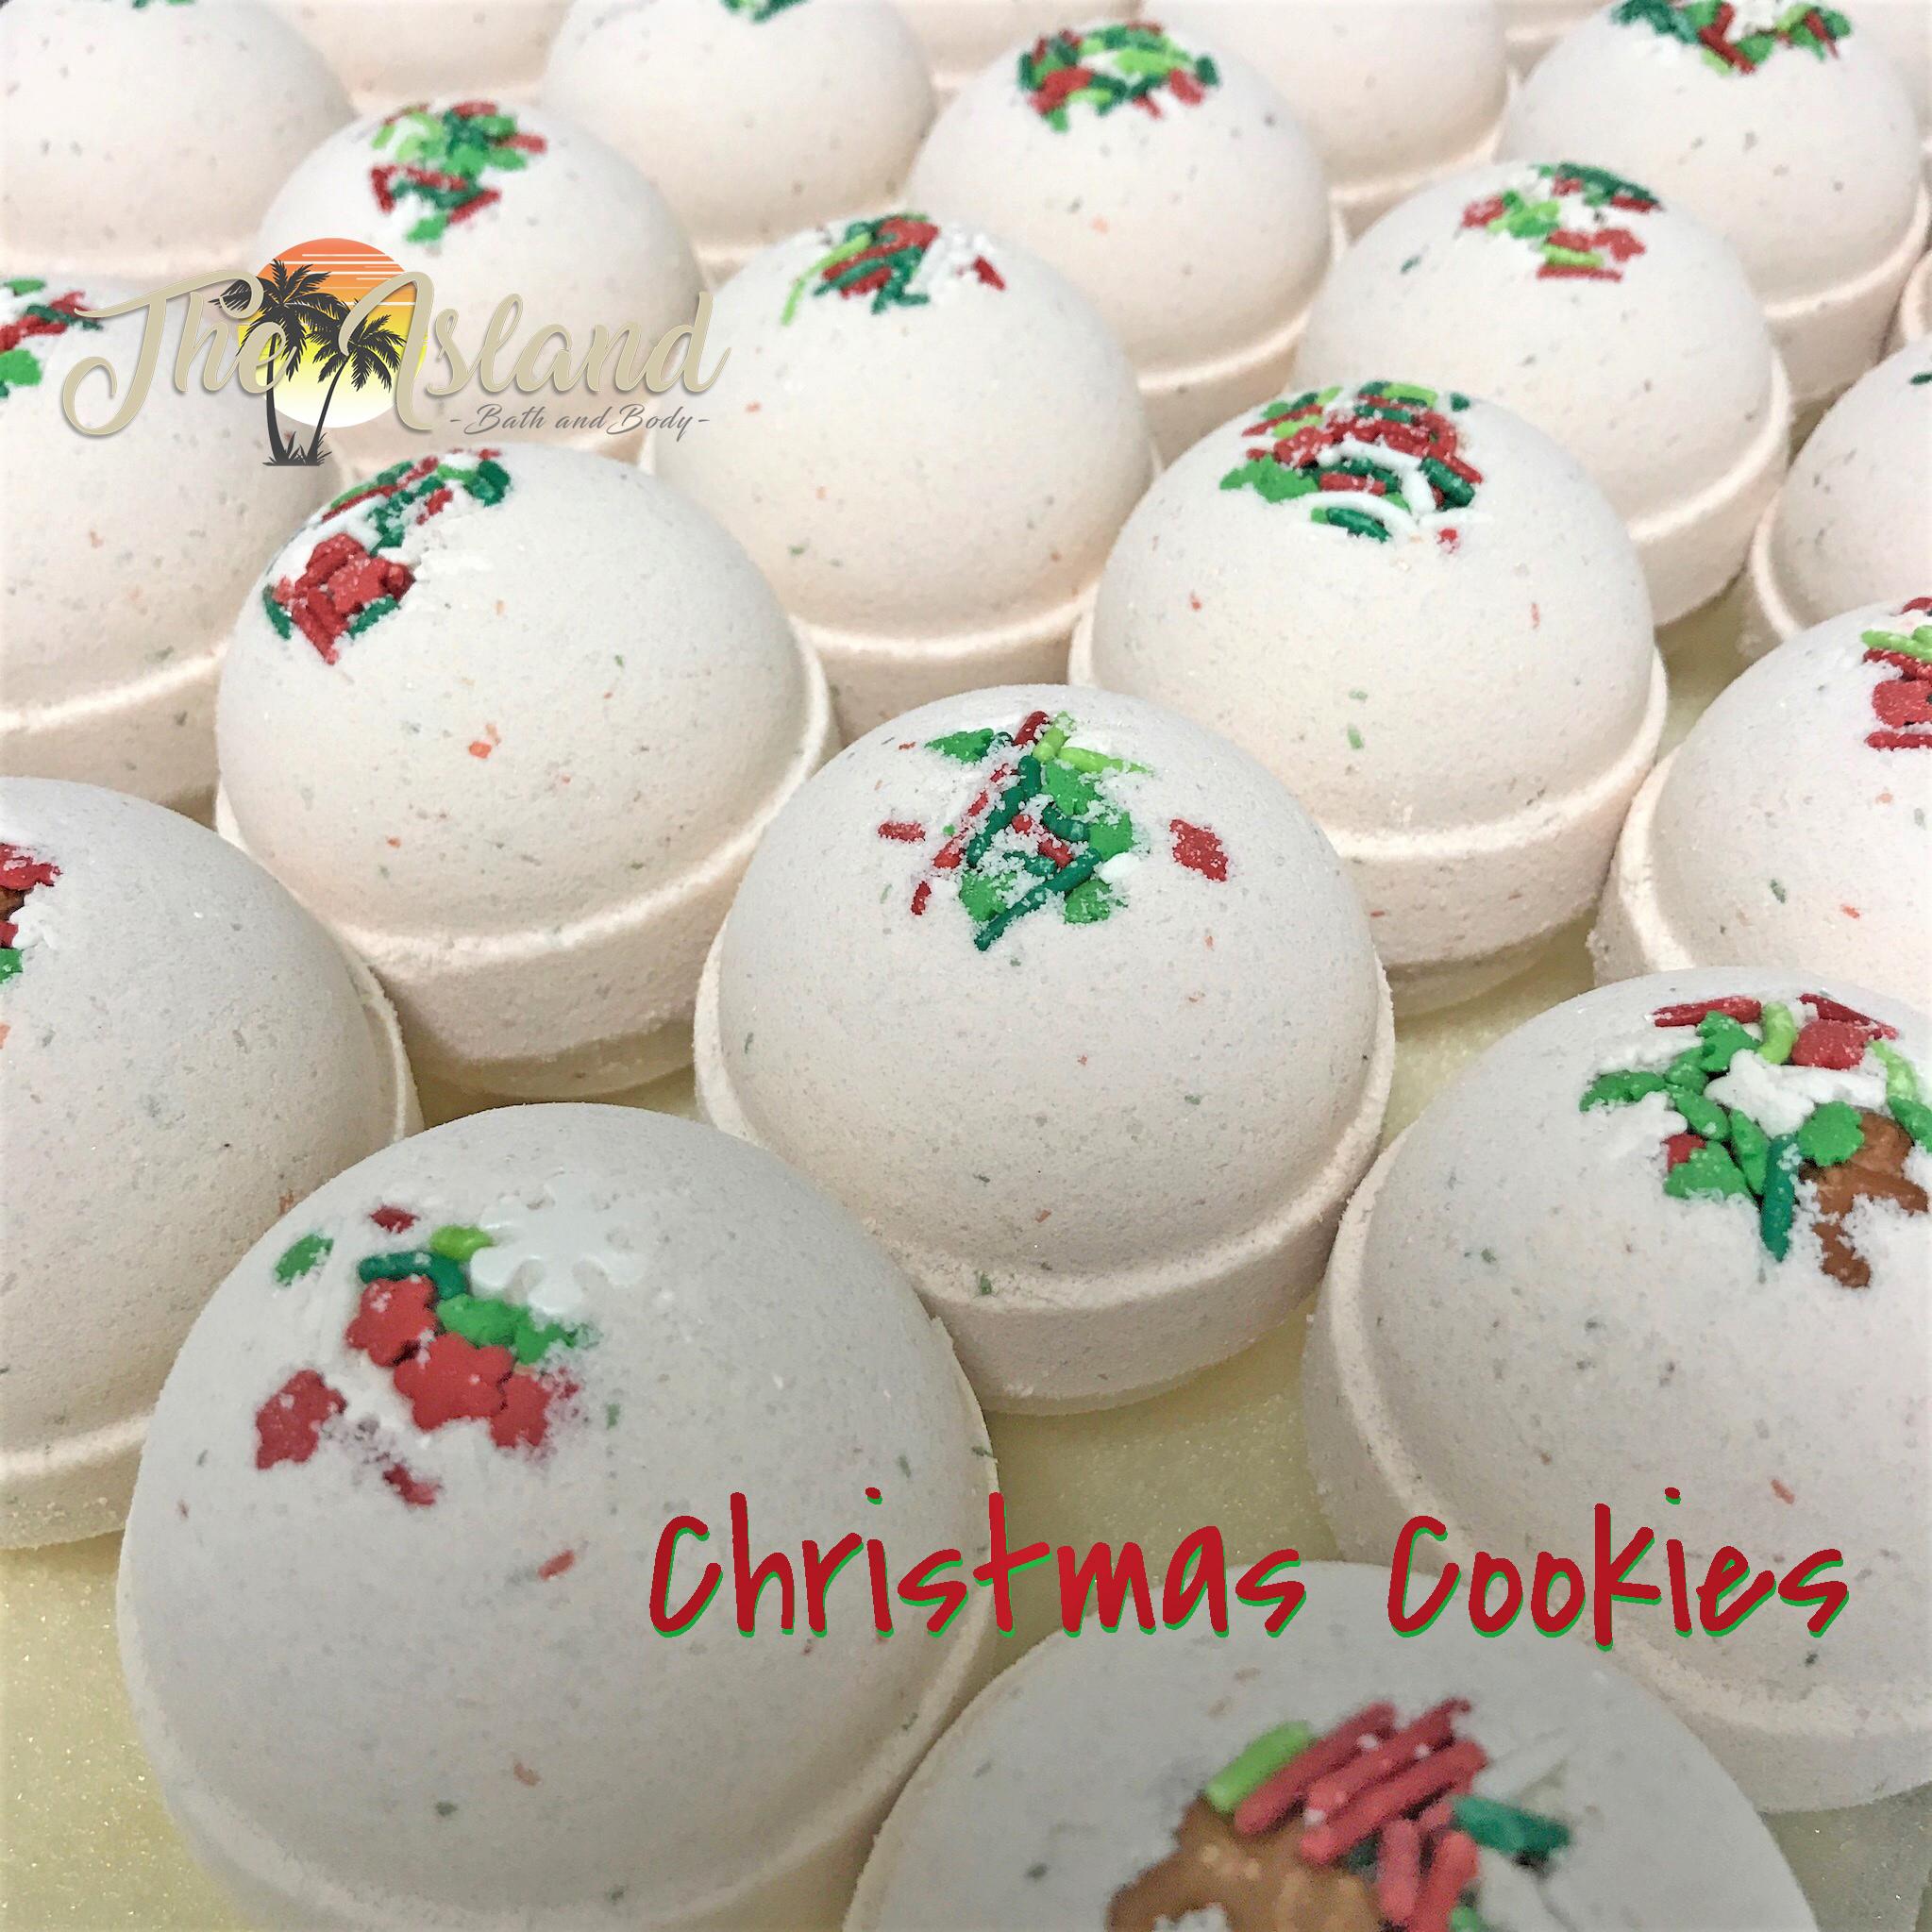 Christmas Bath Bombs.Christmas Cookies 5 5 Oz Bath Bomb By The Island Bath Body